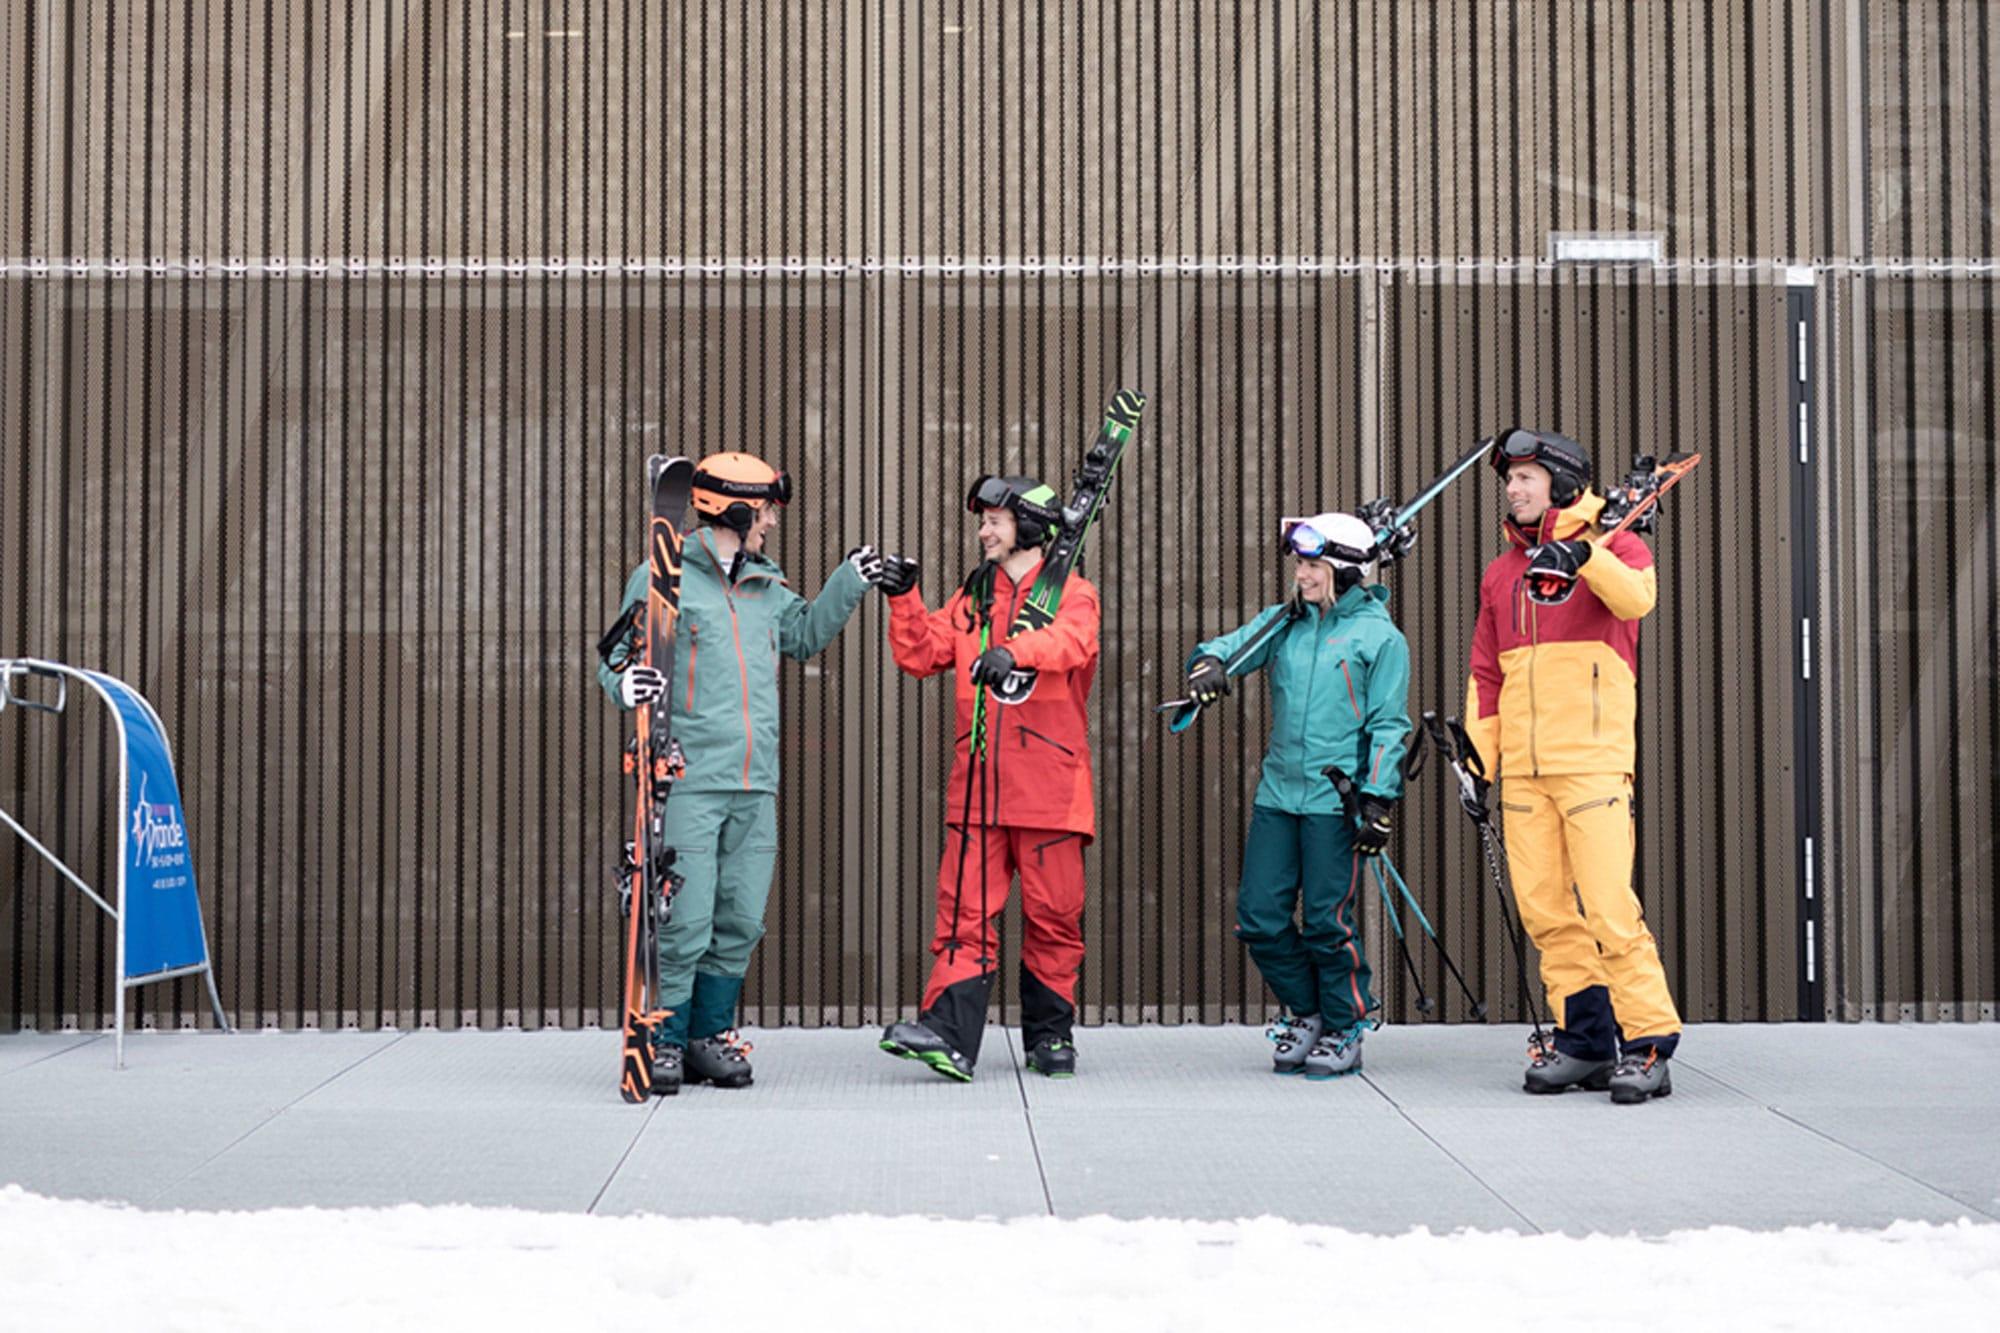 K2 Ski Gruppe